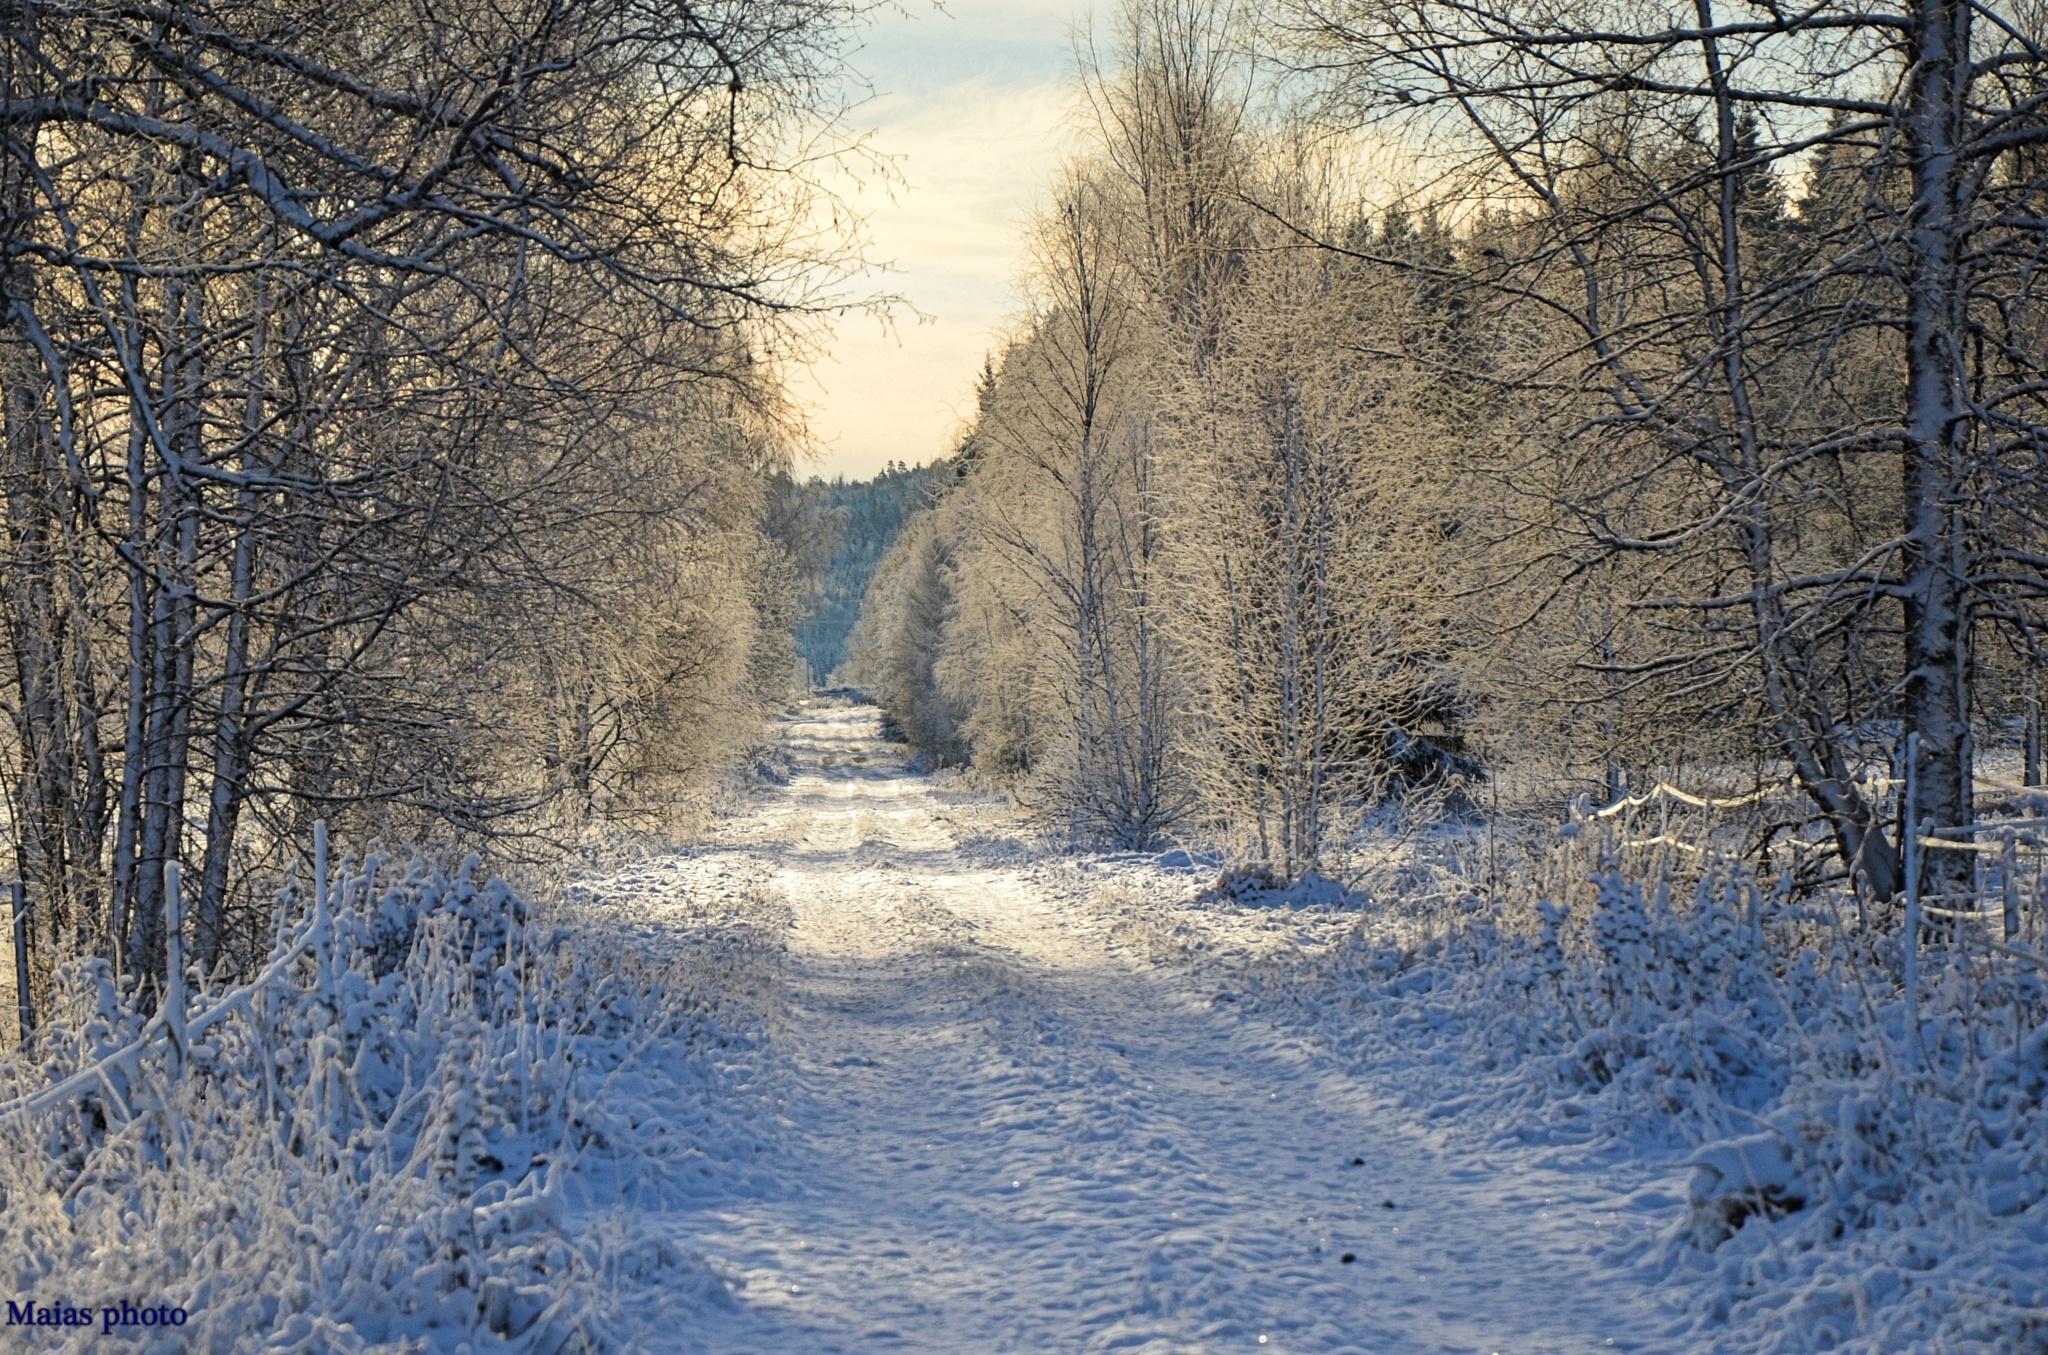 Vinterallé by Maias photo